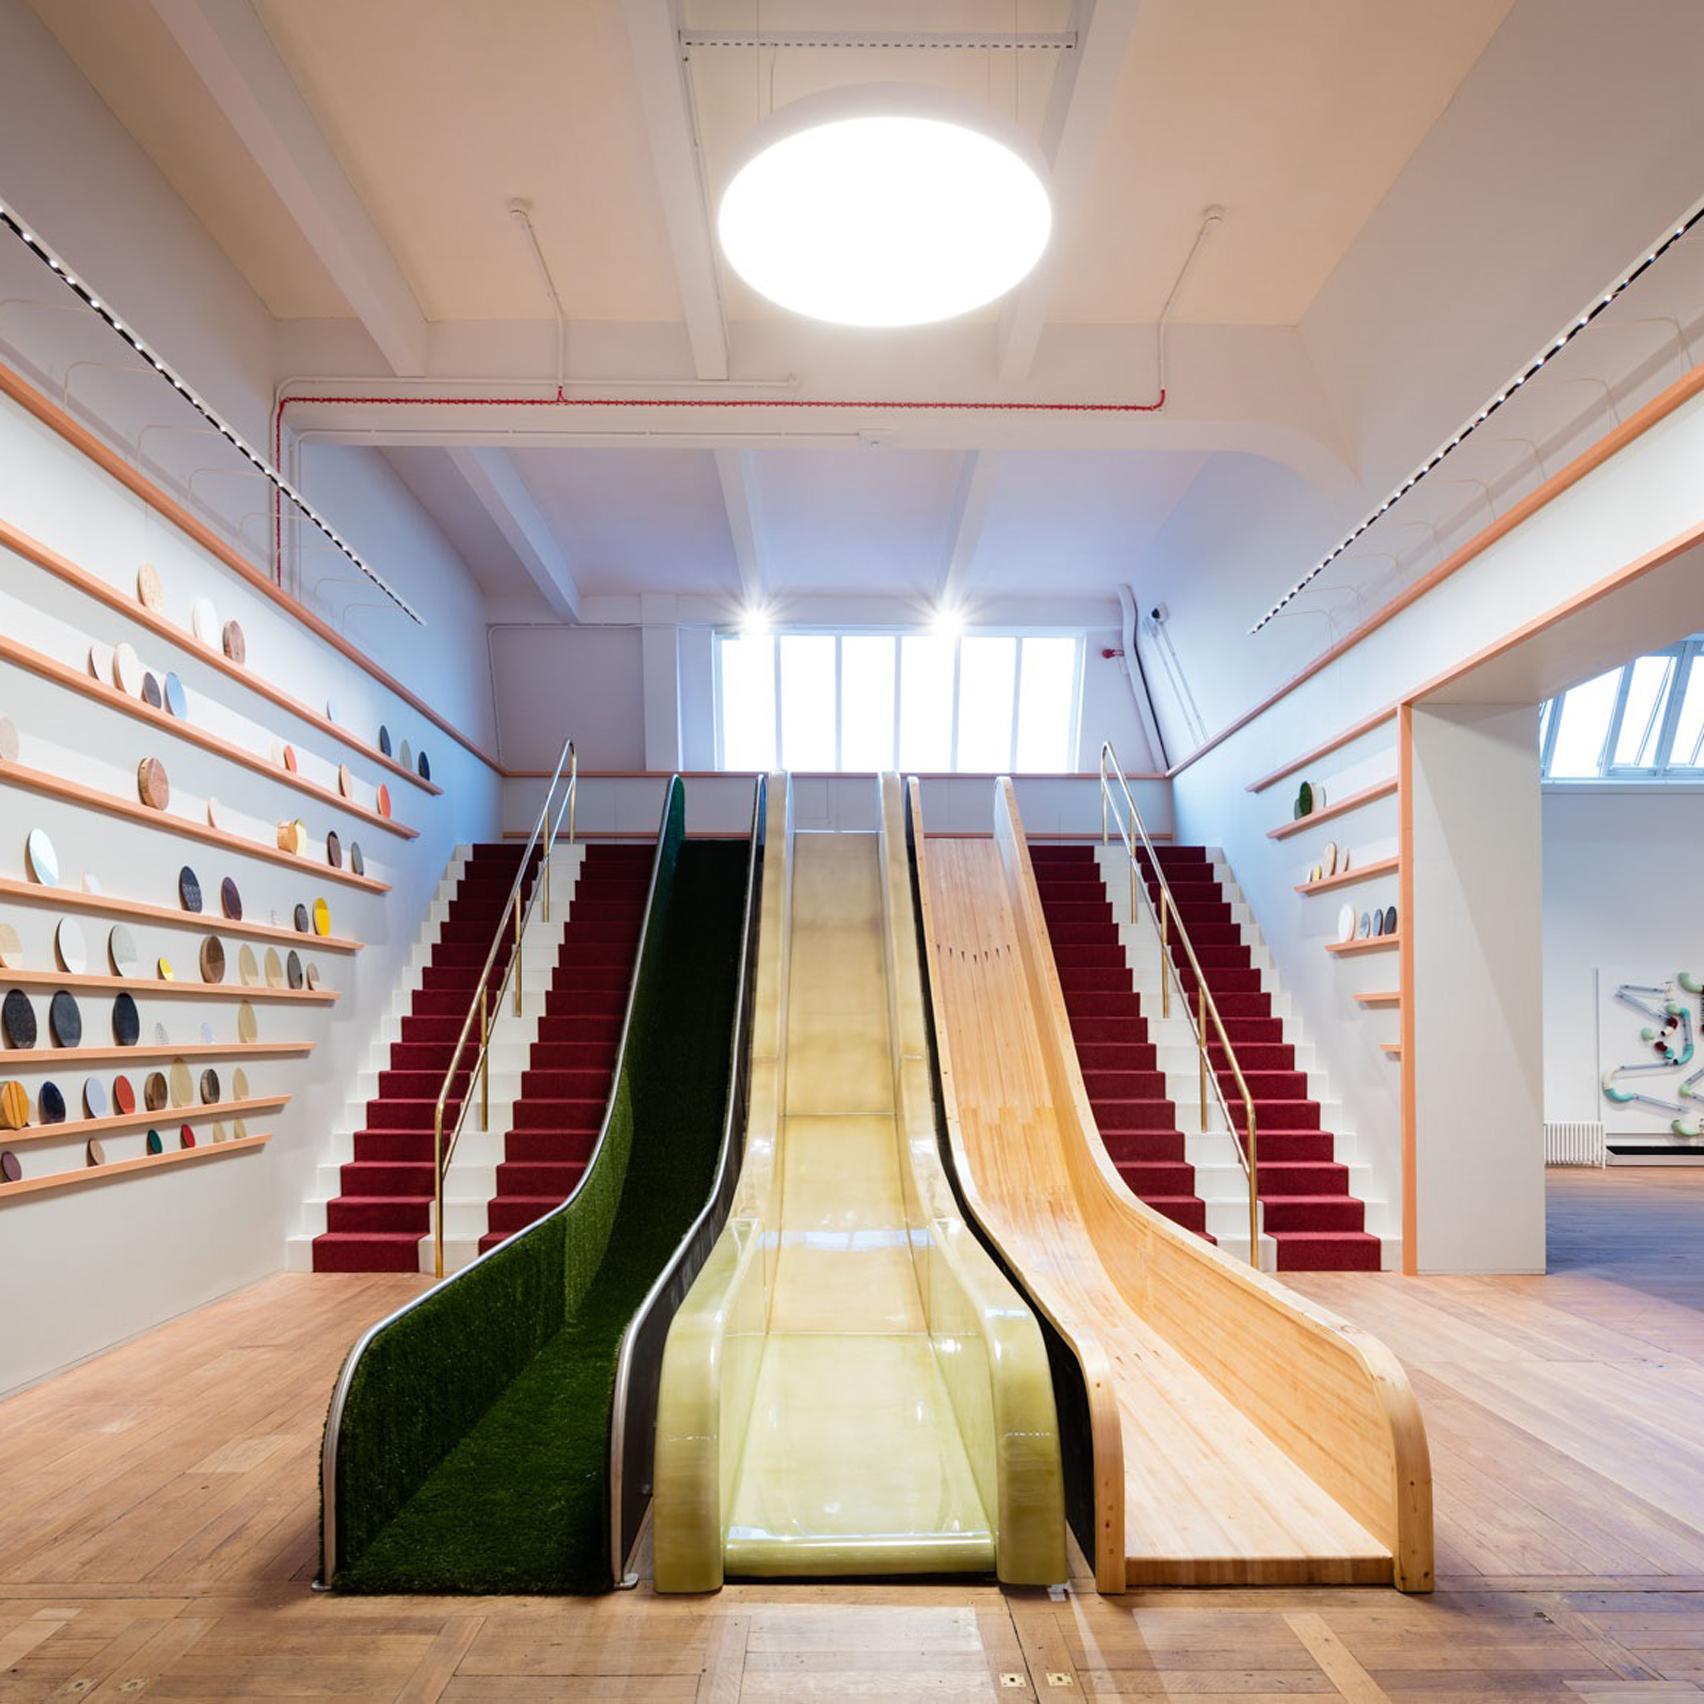 wonderlab-exhibition-interiors-design-science-museum-london-uk_dezeen_sq